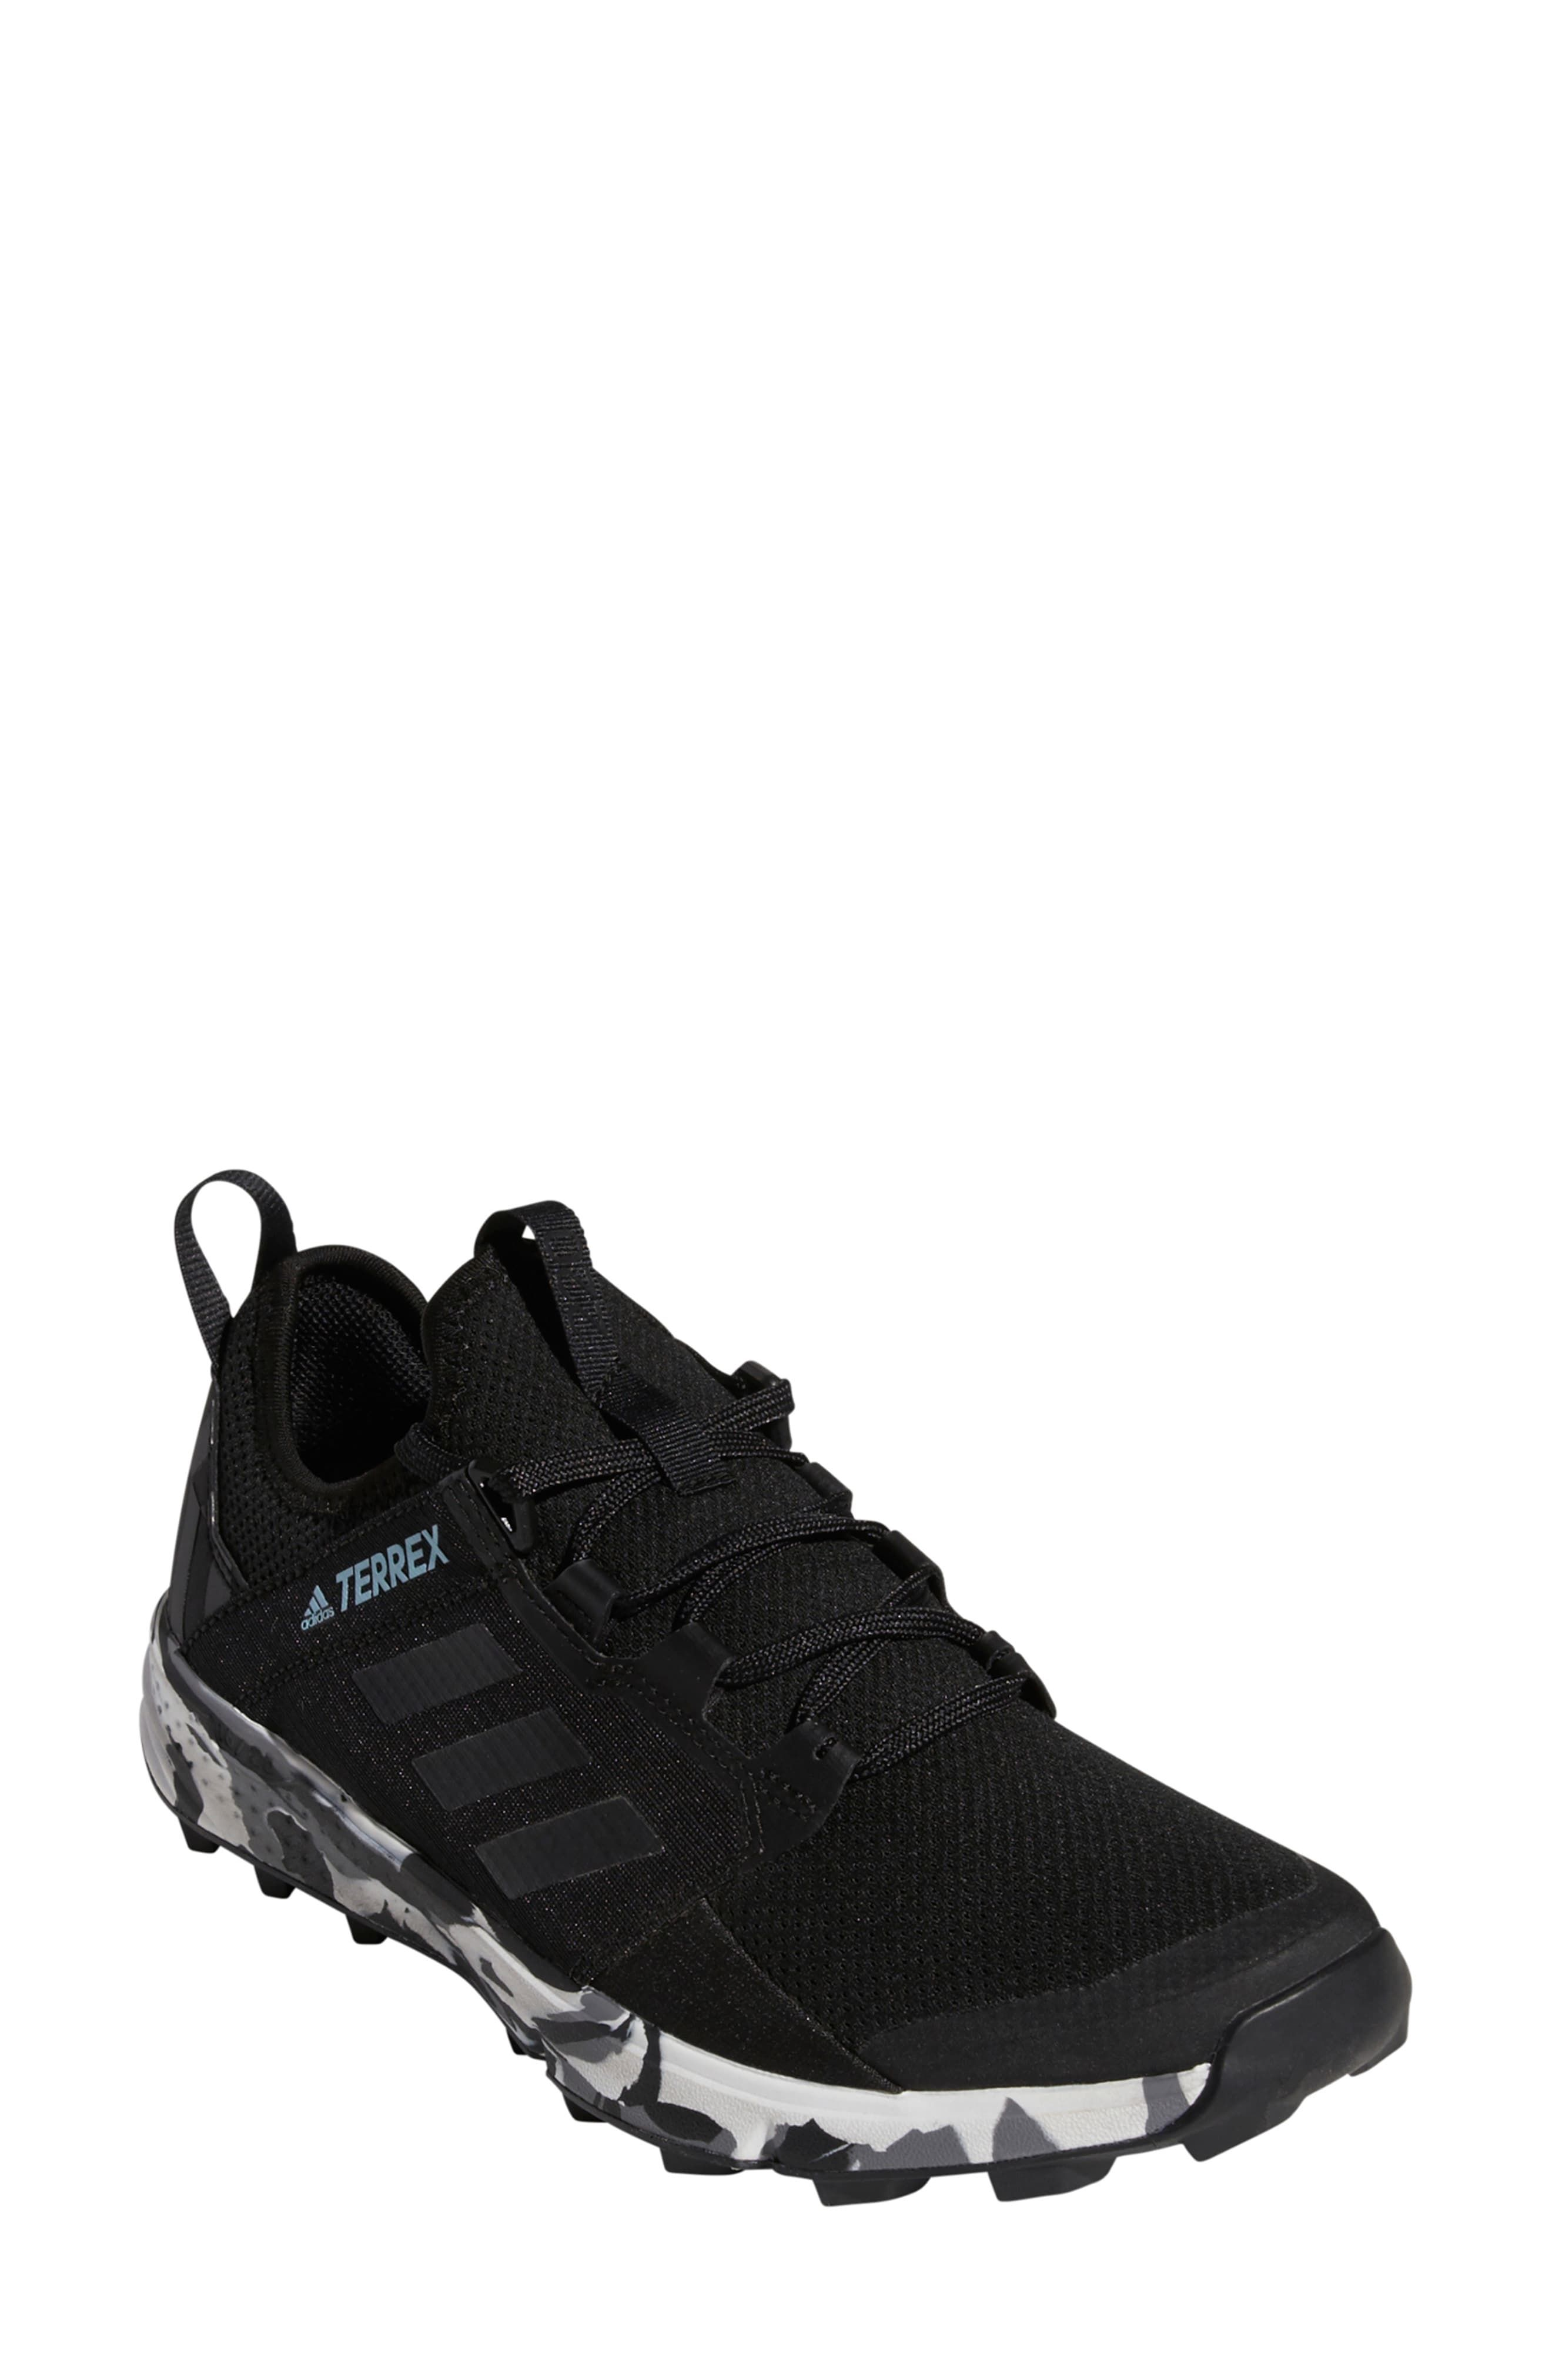 Women's Adidas Terrex Agravic Speed Plus Trail Running Shoe